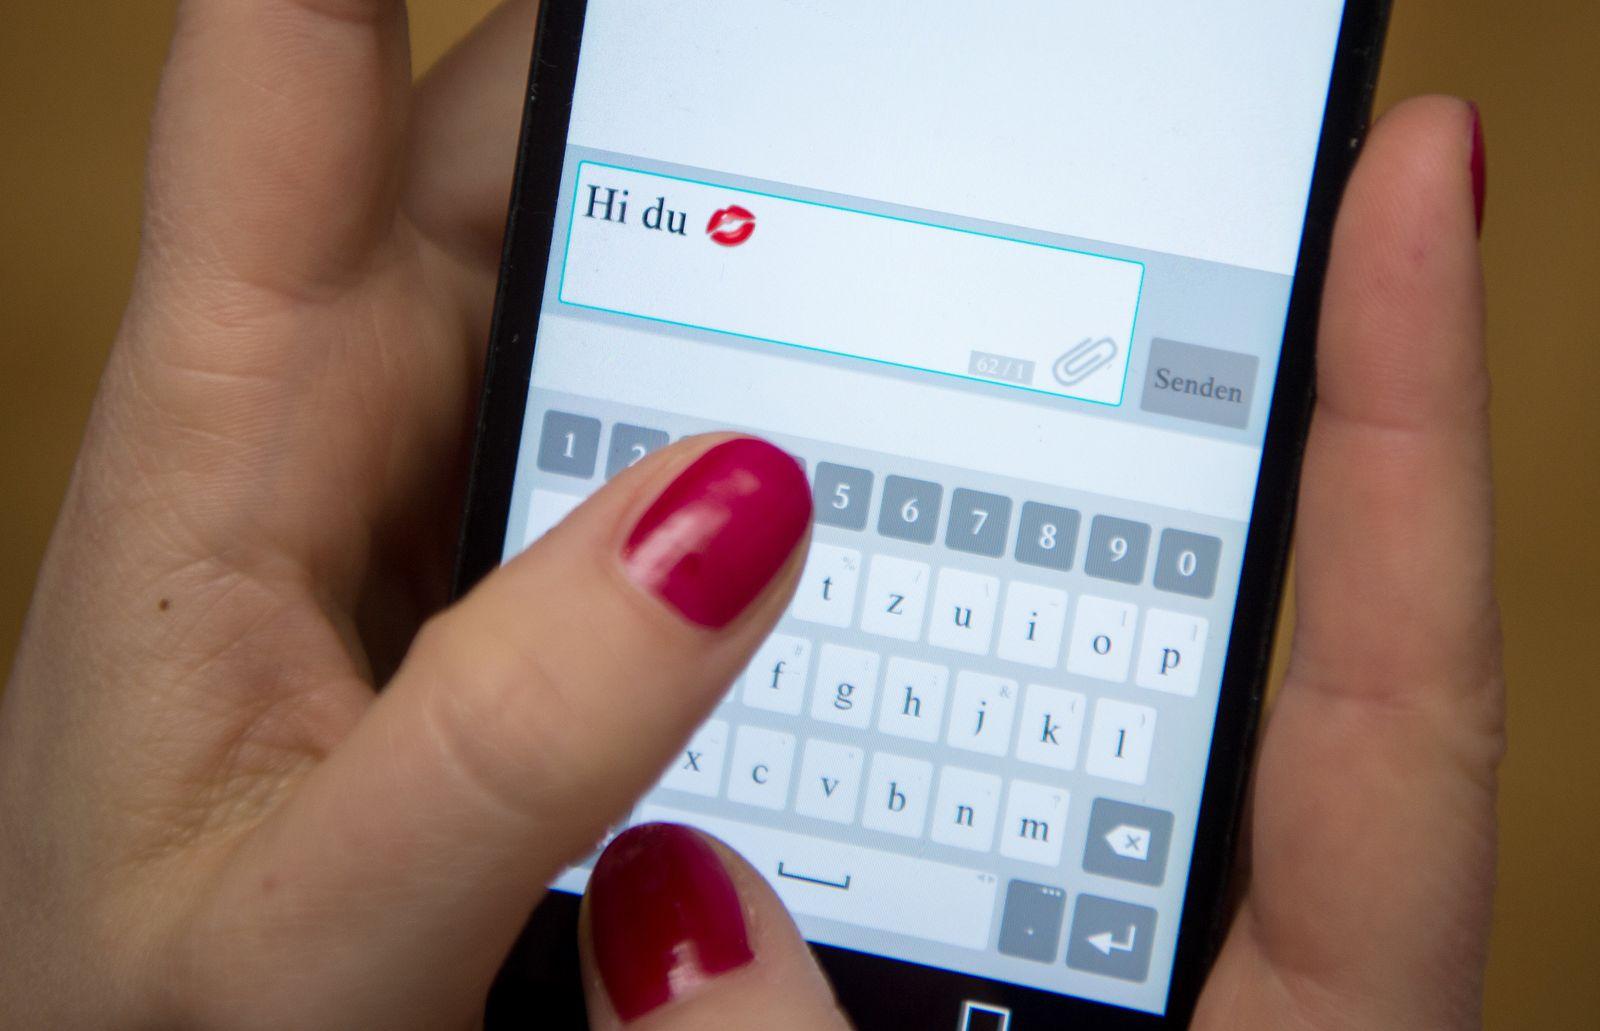 SPERRFRIST 8. AUGUST 20:00 UHR/ Online-Dating